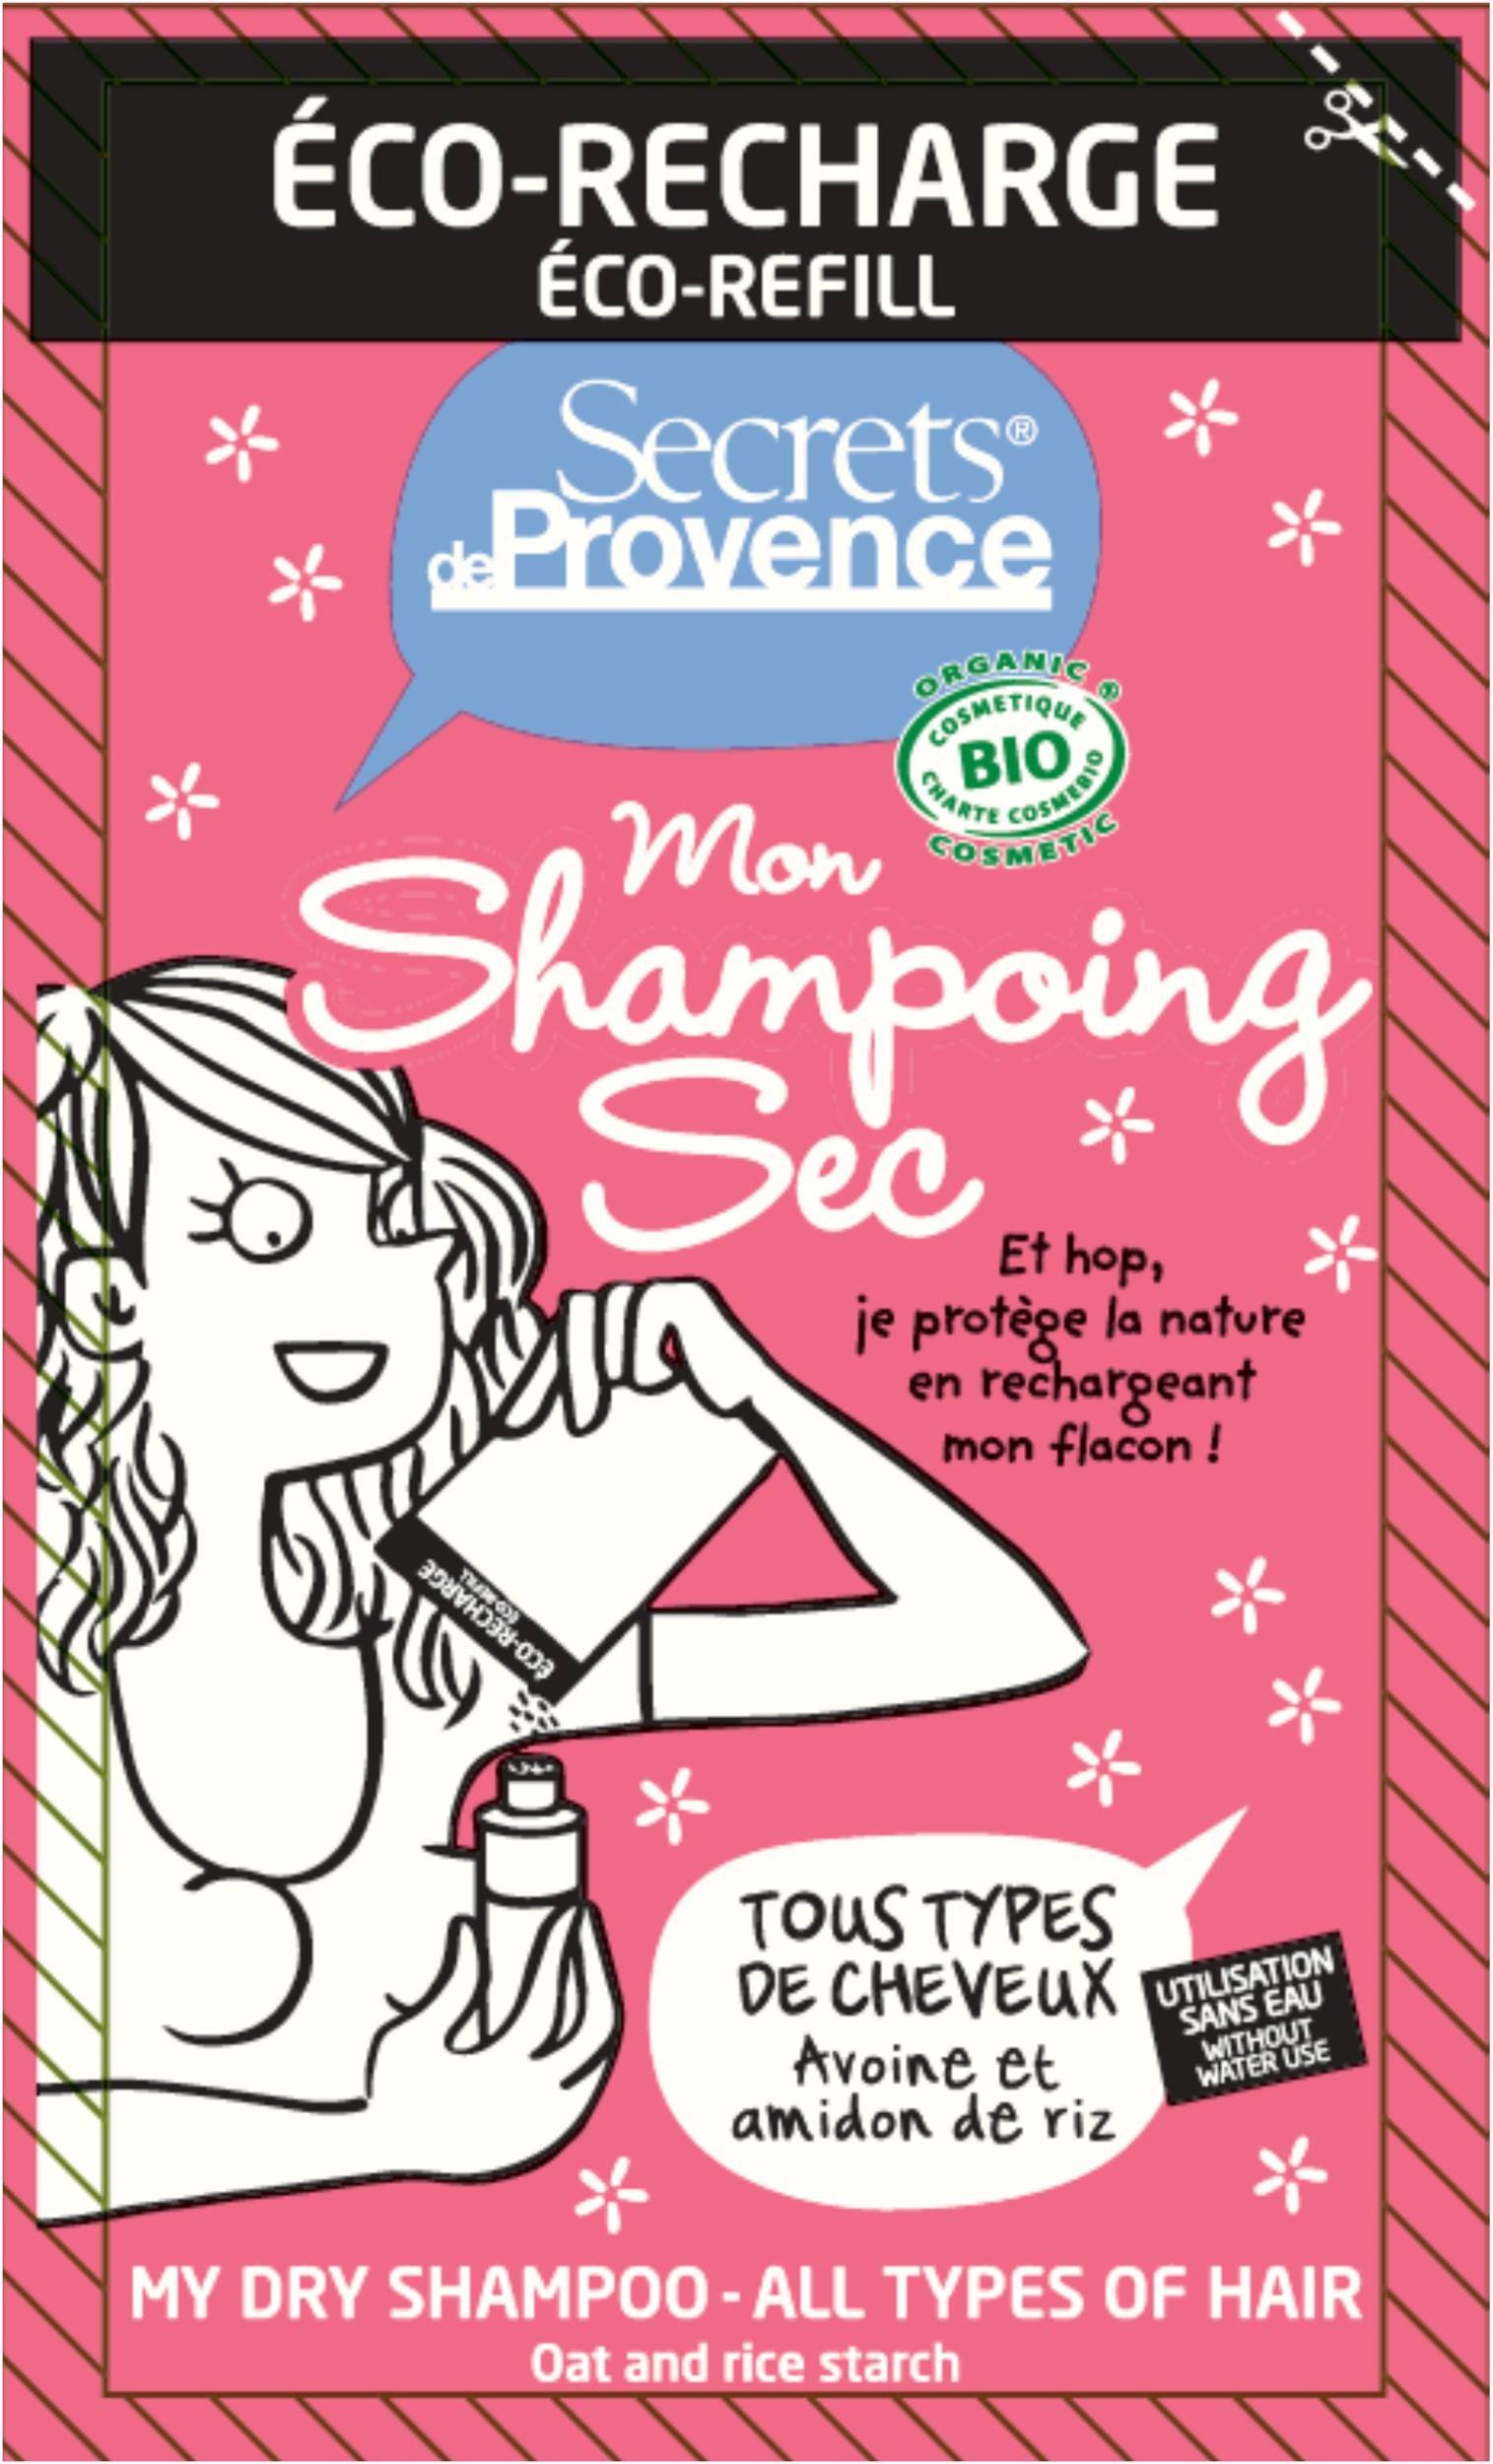 Eco-recharge Shampoing sec Secrets de provence